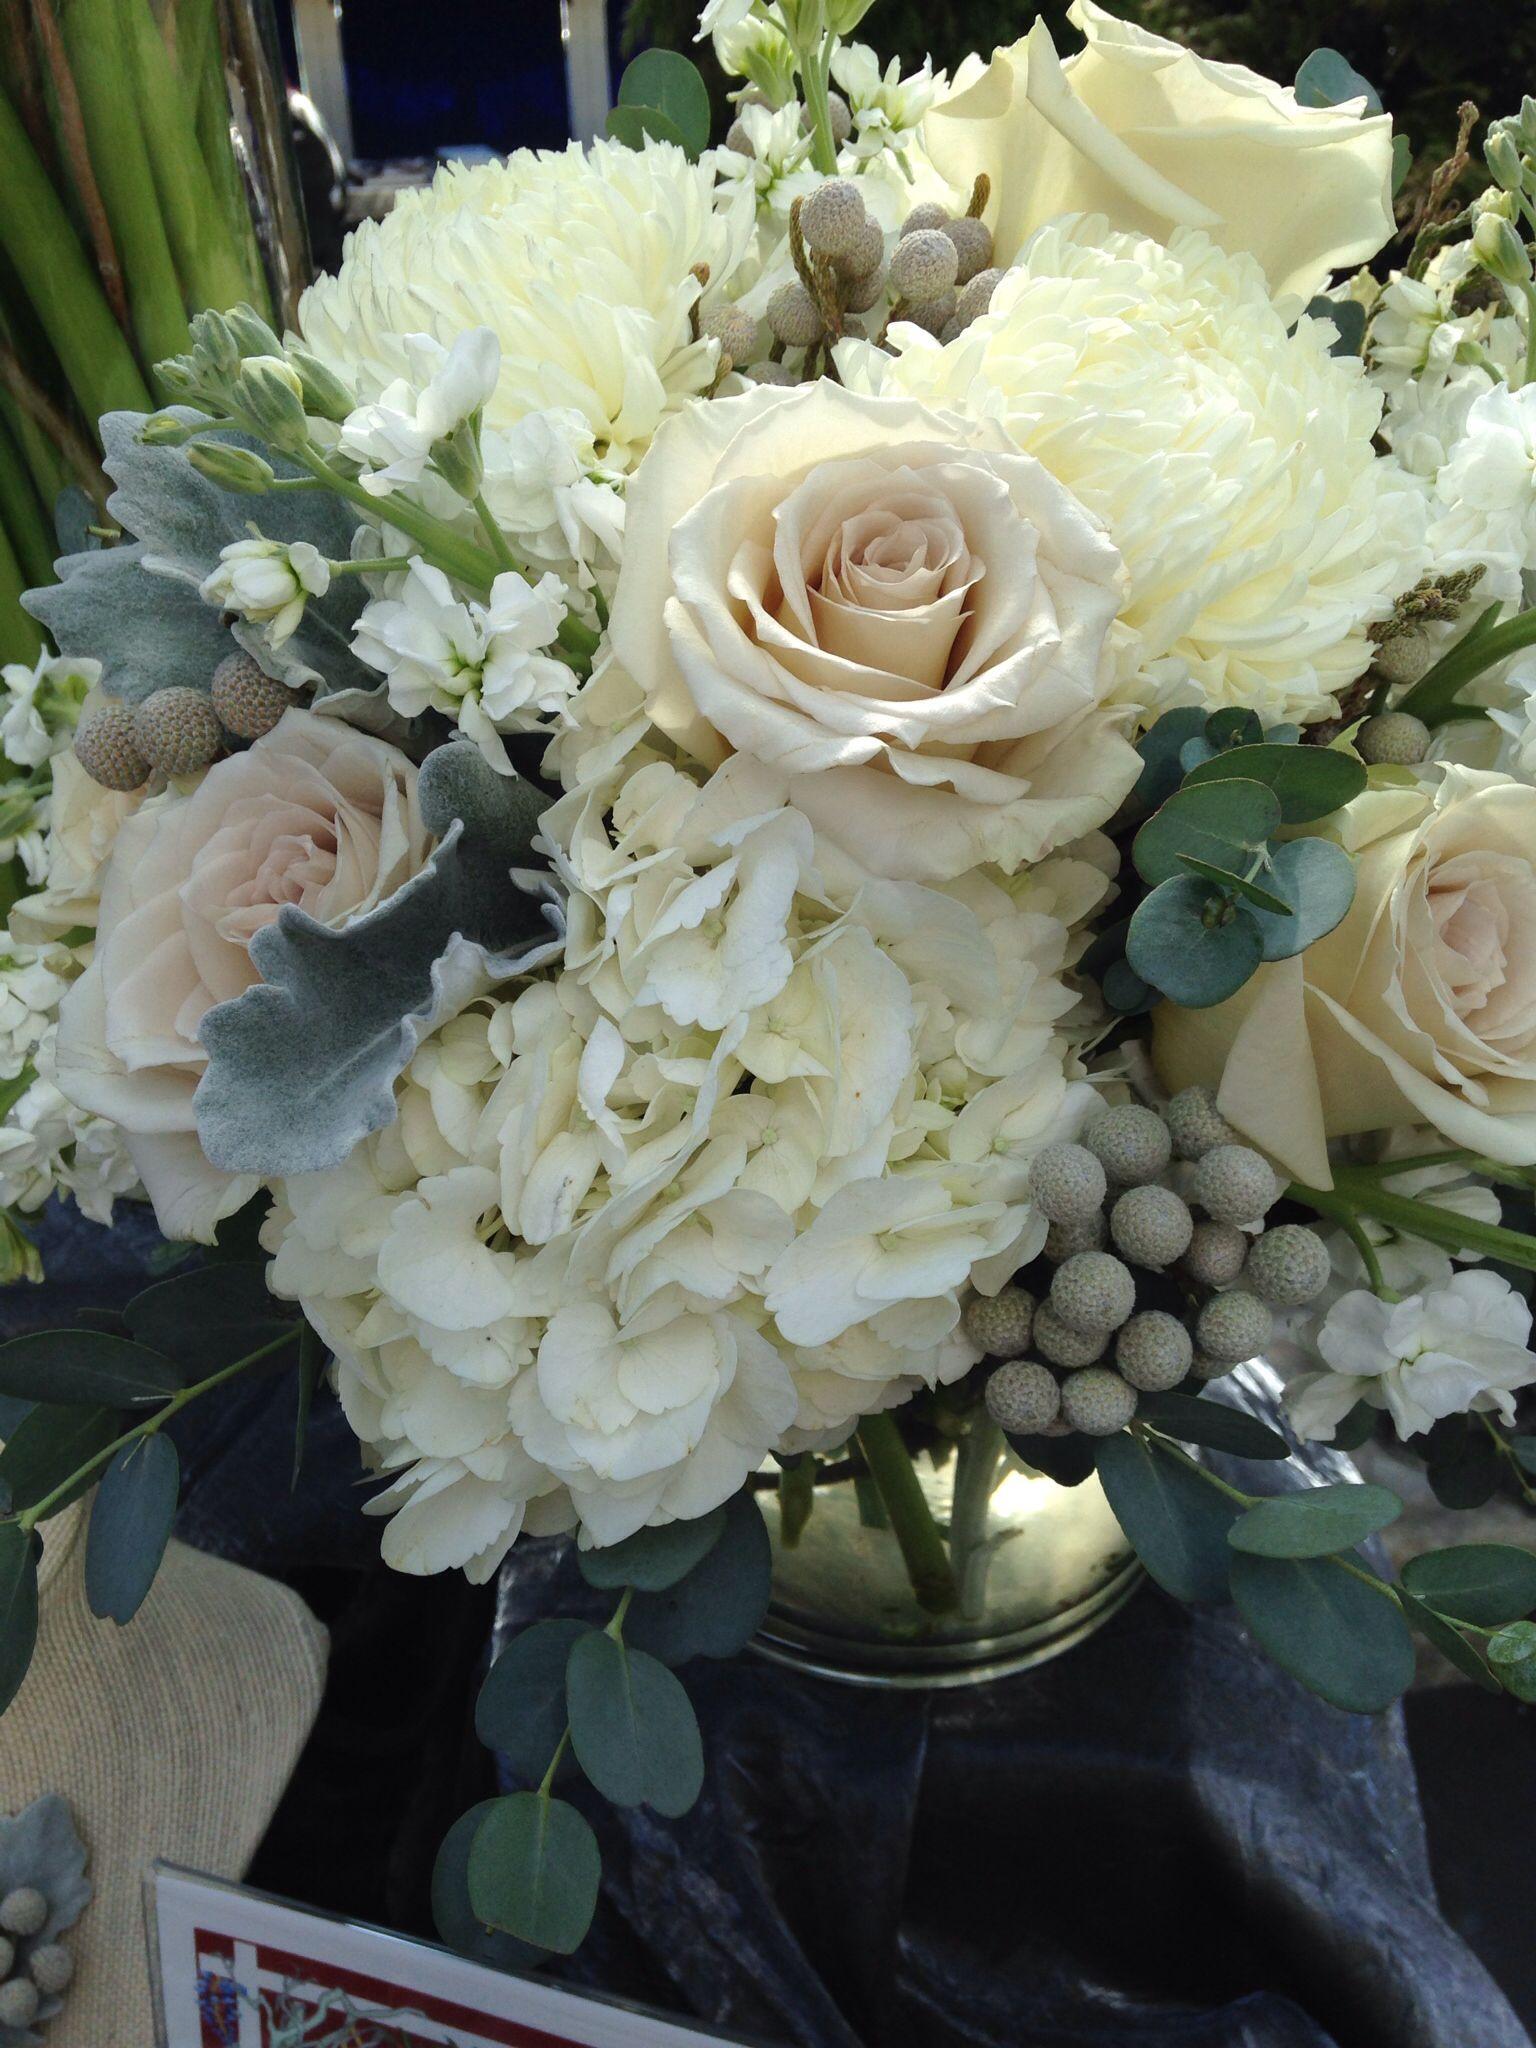 White Hydrangea Earl Grey Rosesilver Brunia White Stock